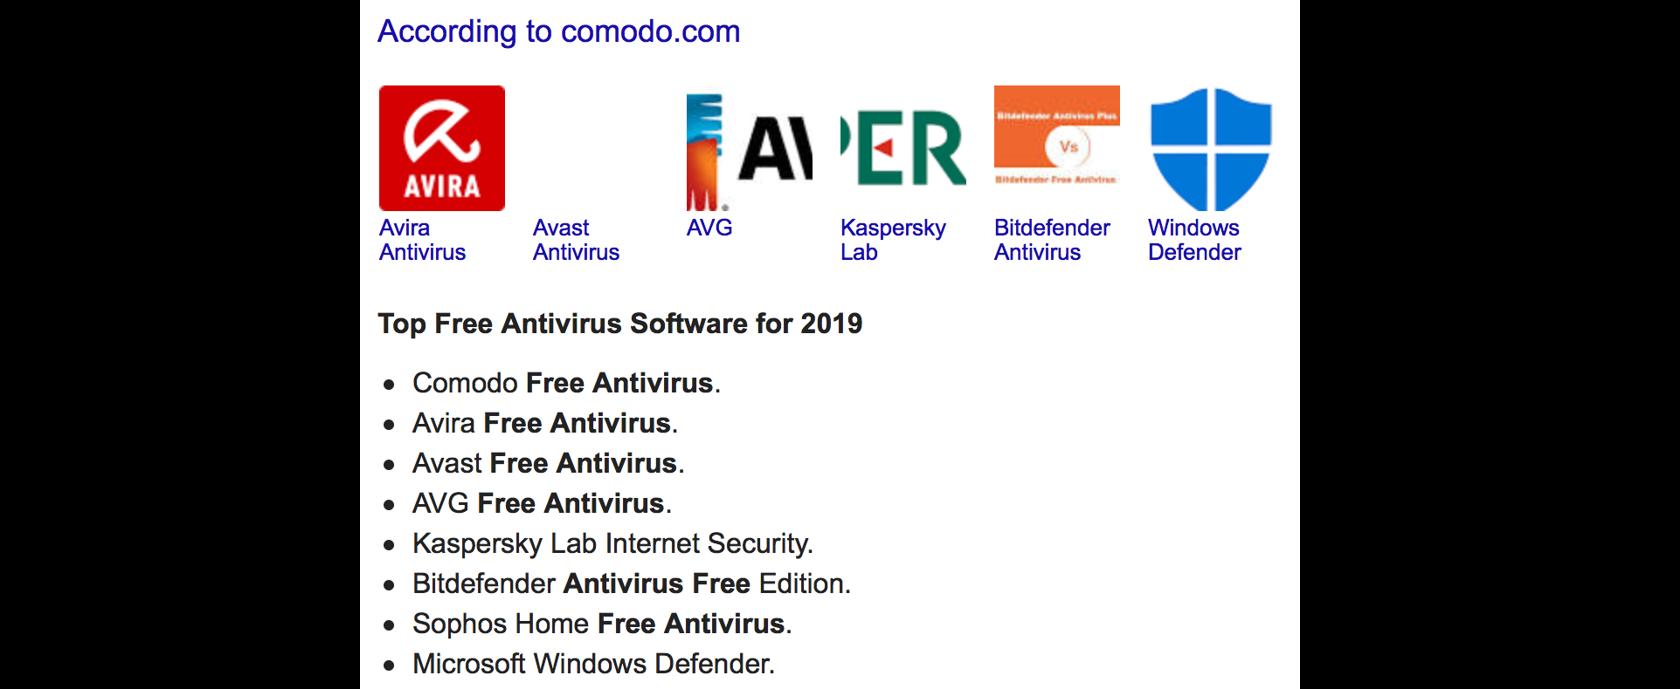 list of top free antivirus software